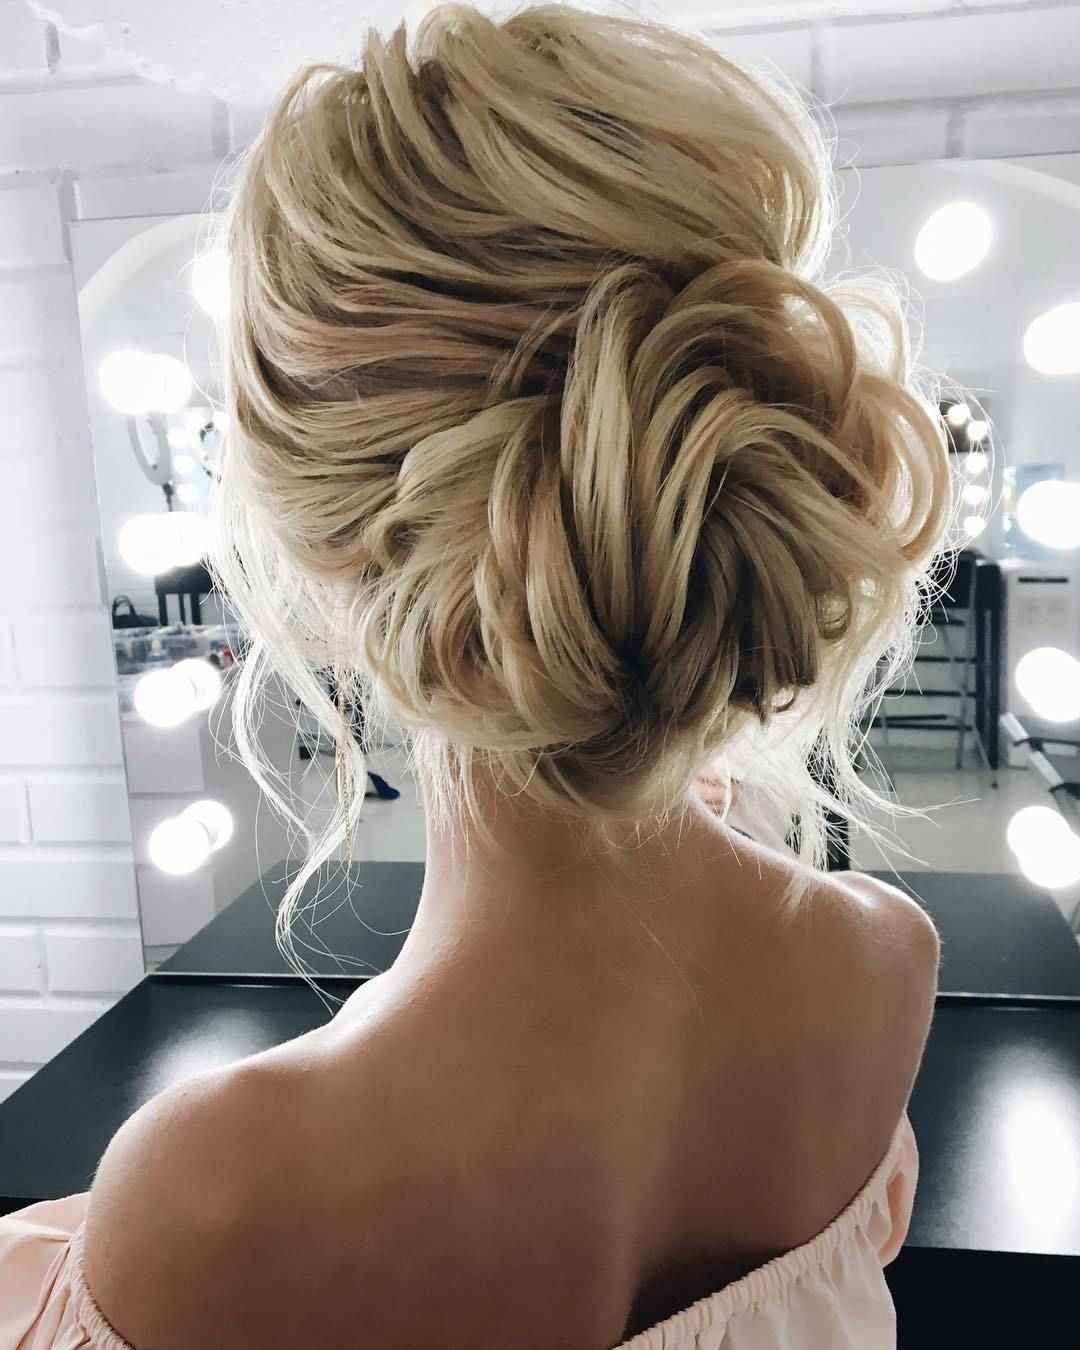 Fabulous textured updo hairstyle - wedding updo #hairstyle #hair #updo #weddinghairstyles